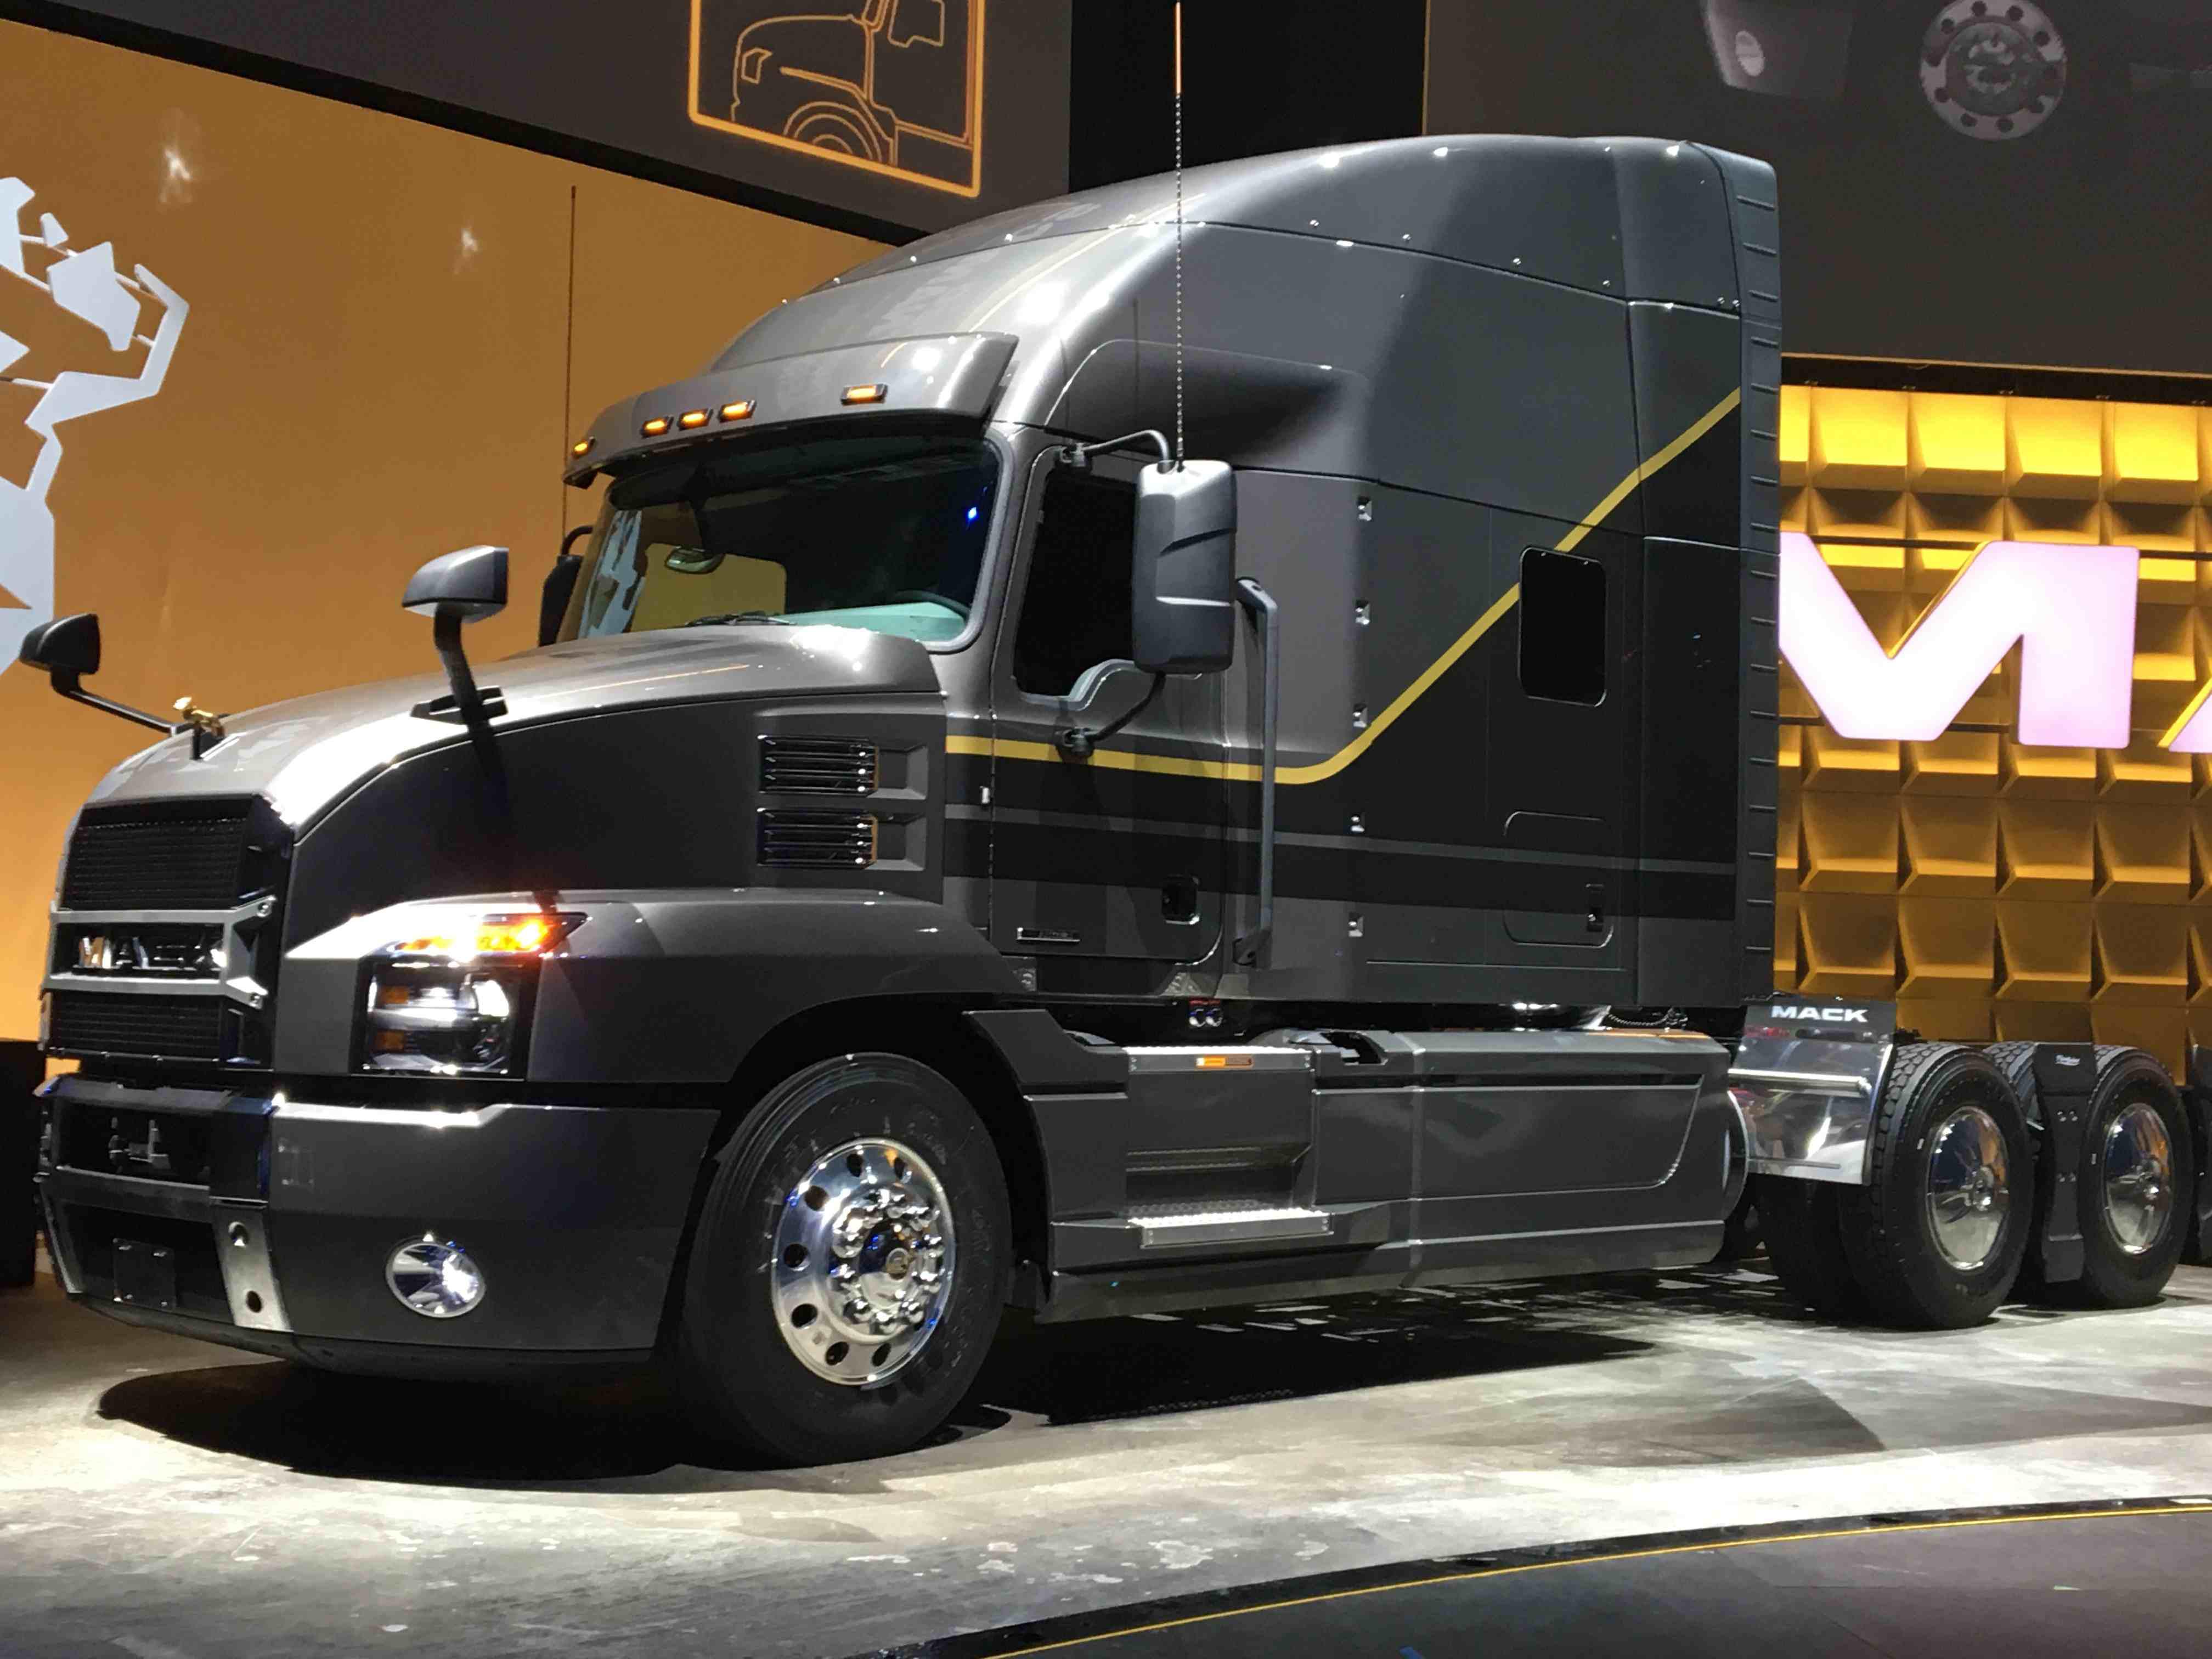 Mack Truck on Display Room Floor